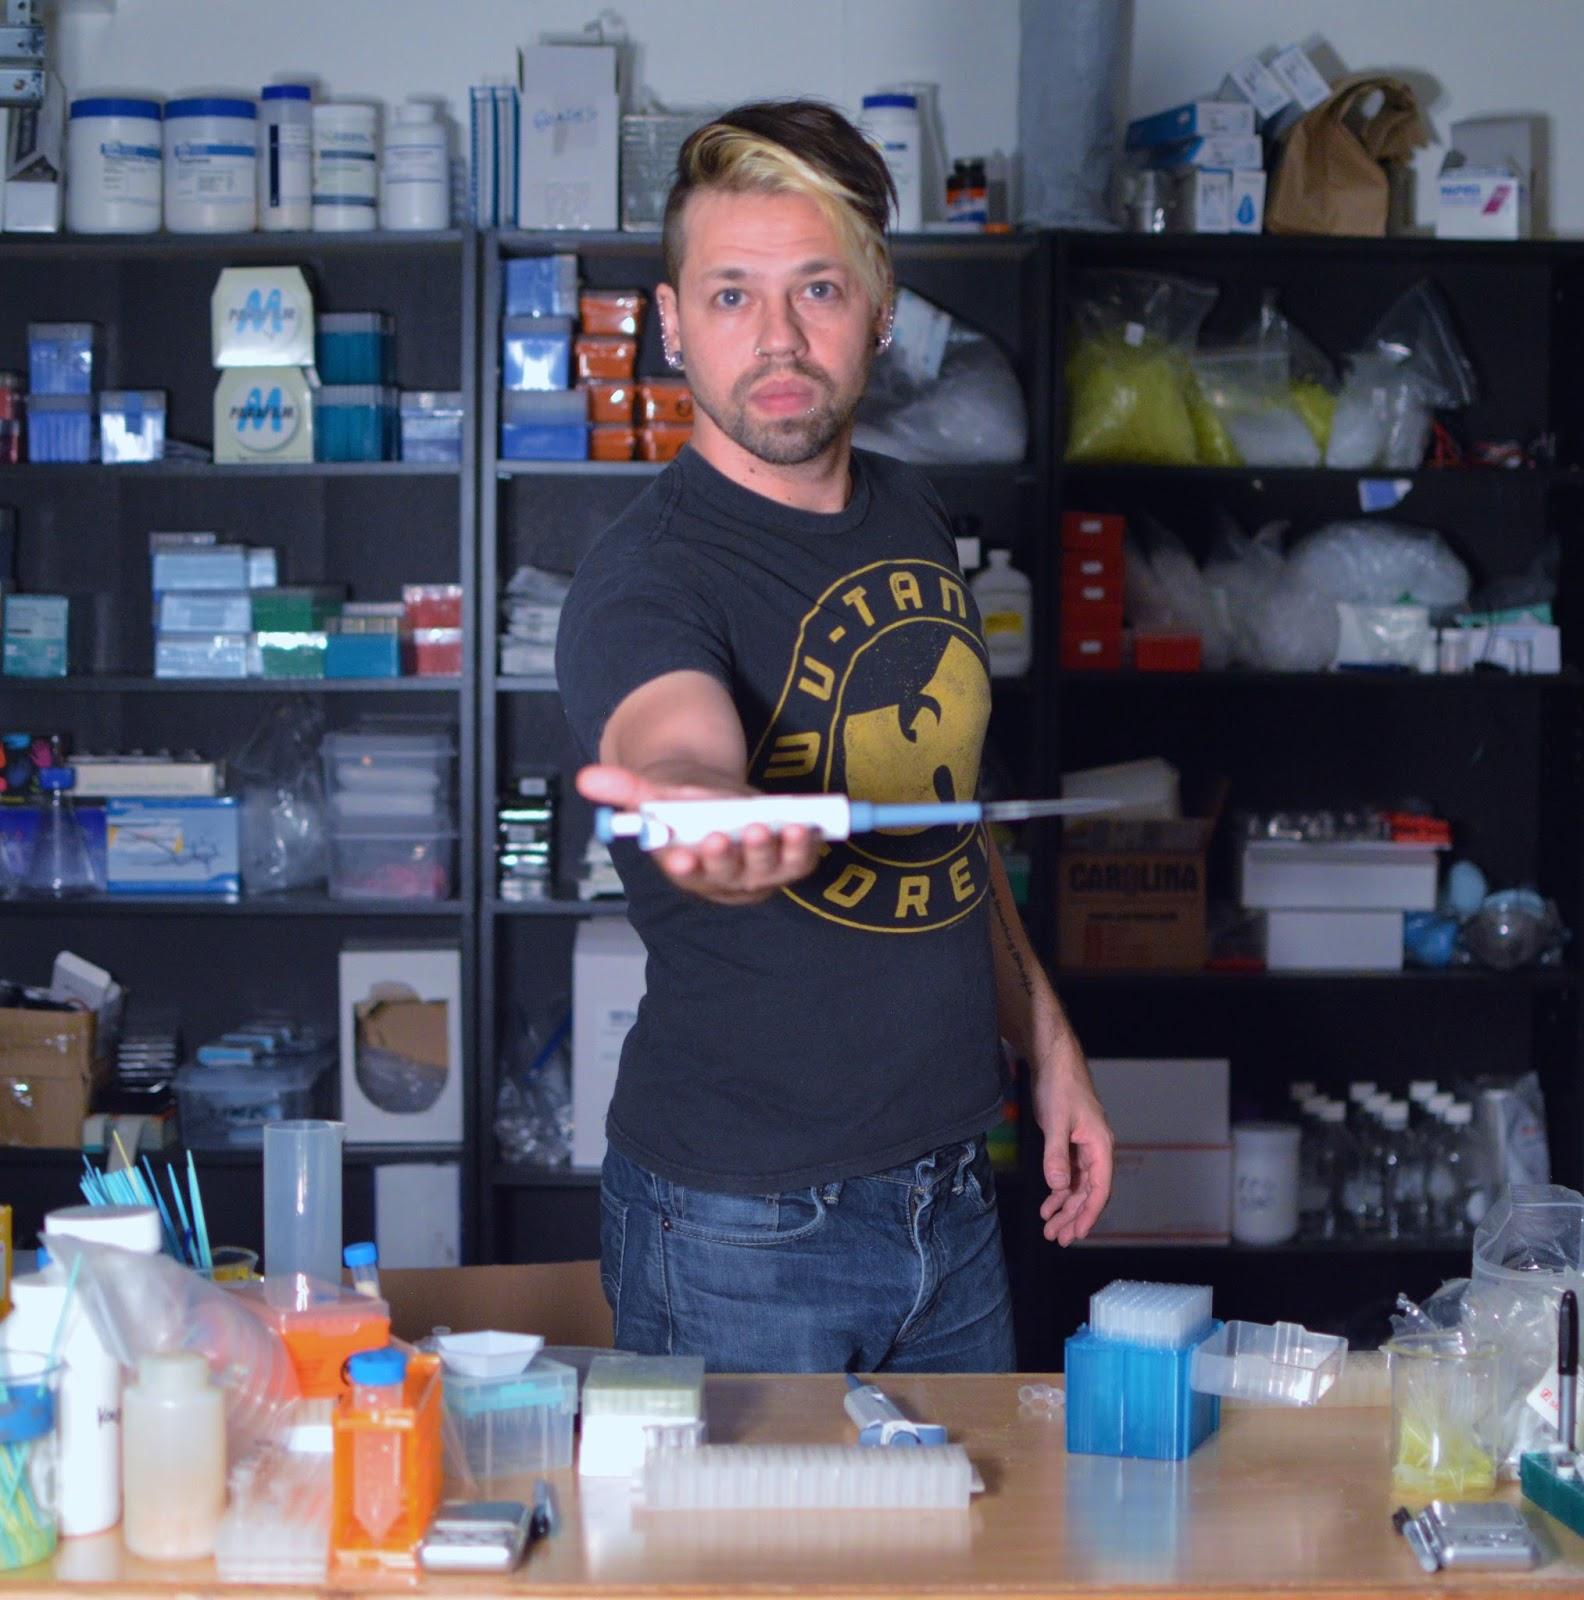 Celebrity biohacker Josiah Zayner is under investigation for practicing medicine without a license